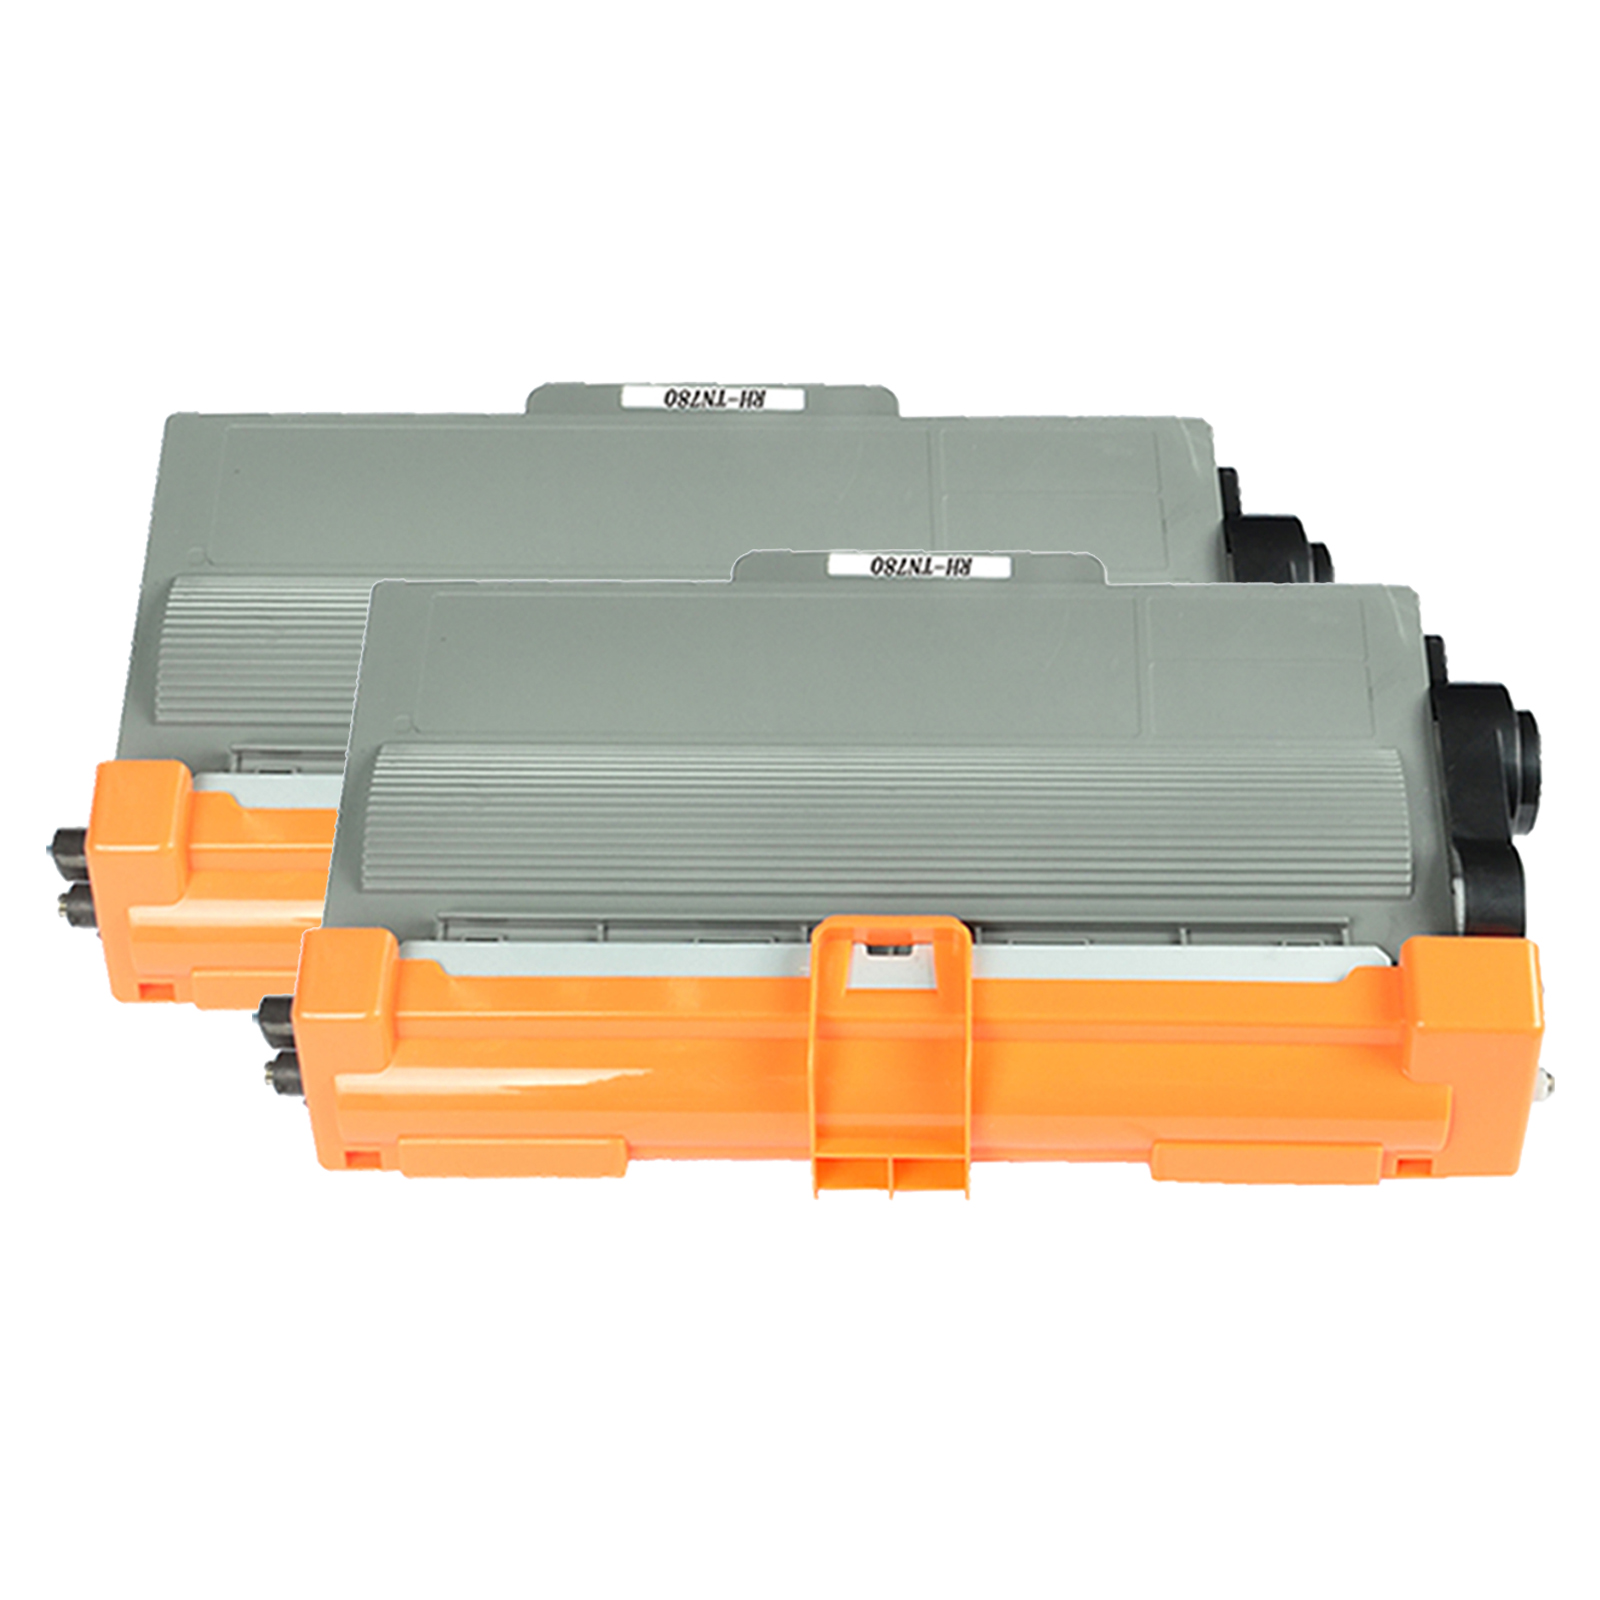 2pk Black Laser Toner Cartridge for Brother TN780 TN-780 HL-6180DW HL-6180